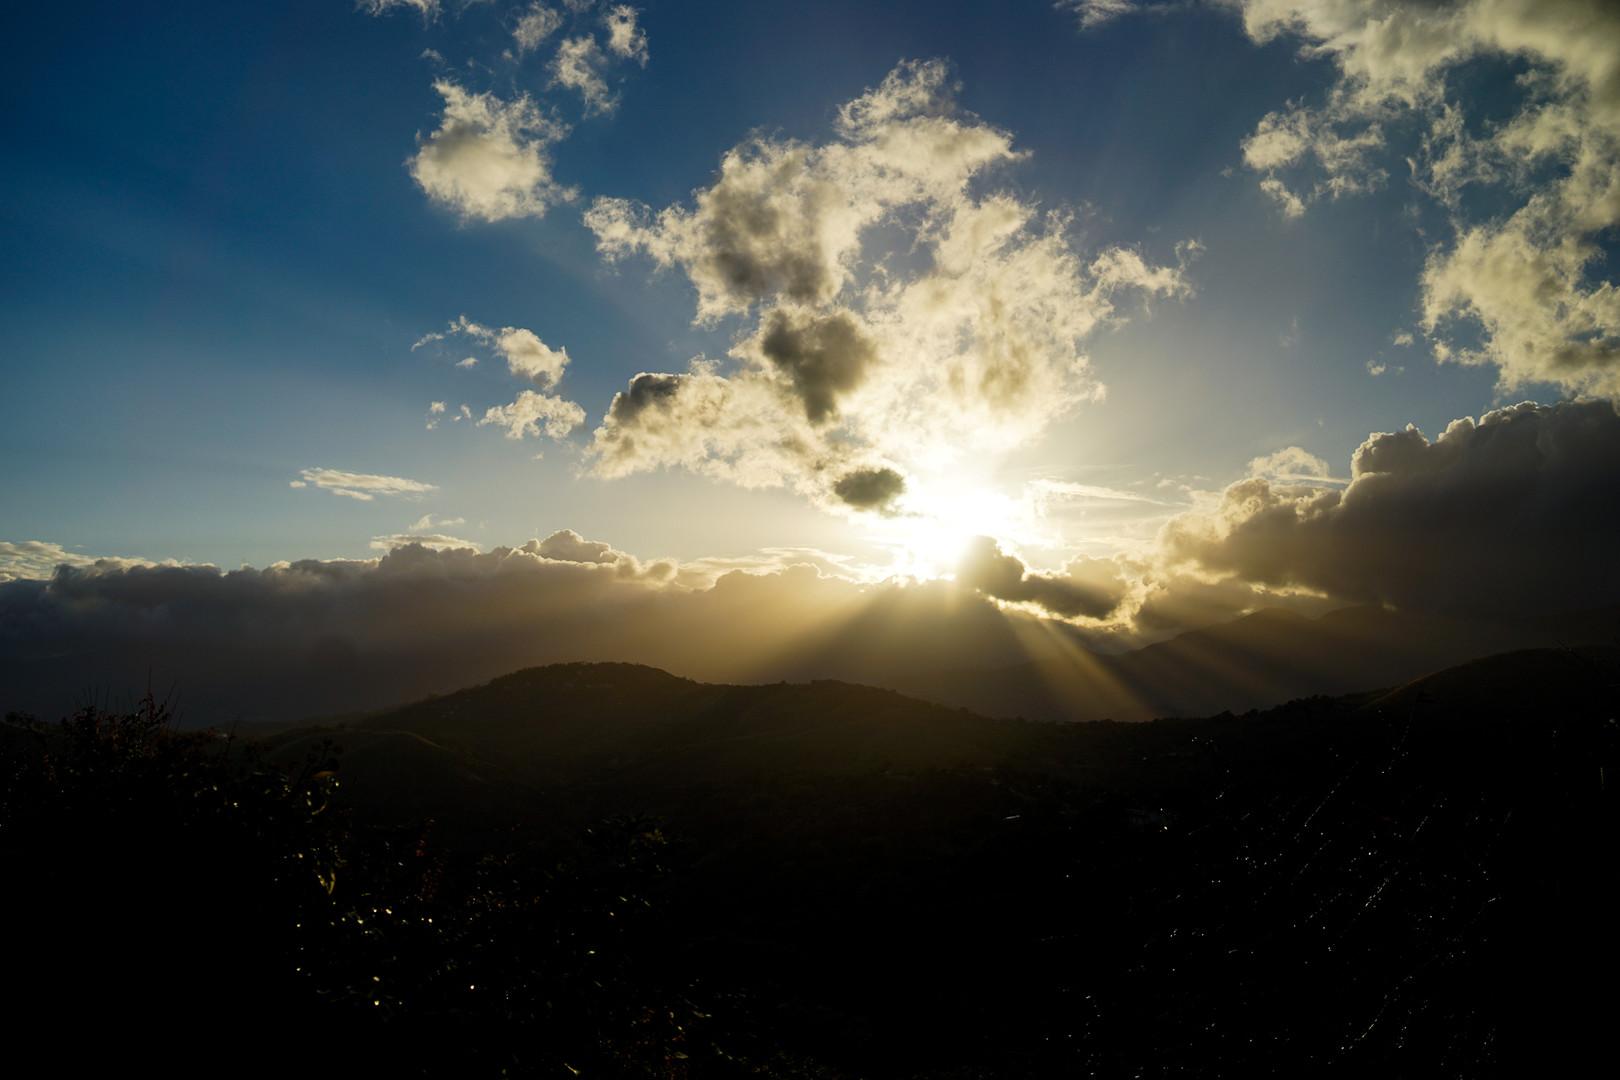 Dawn in Calabria